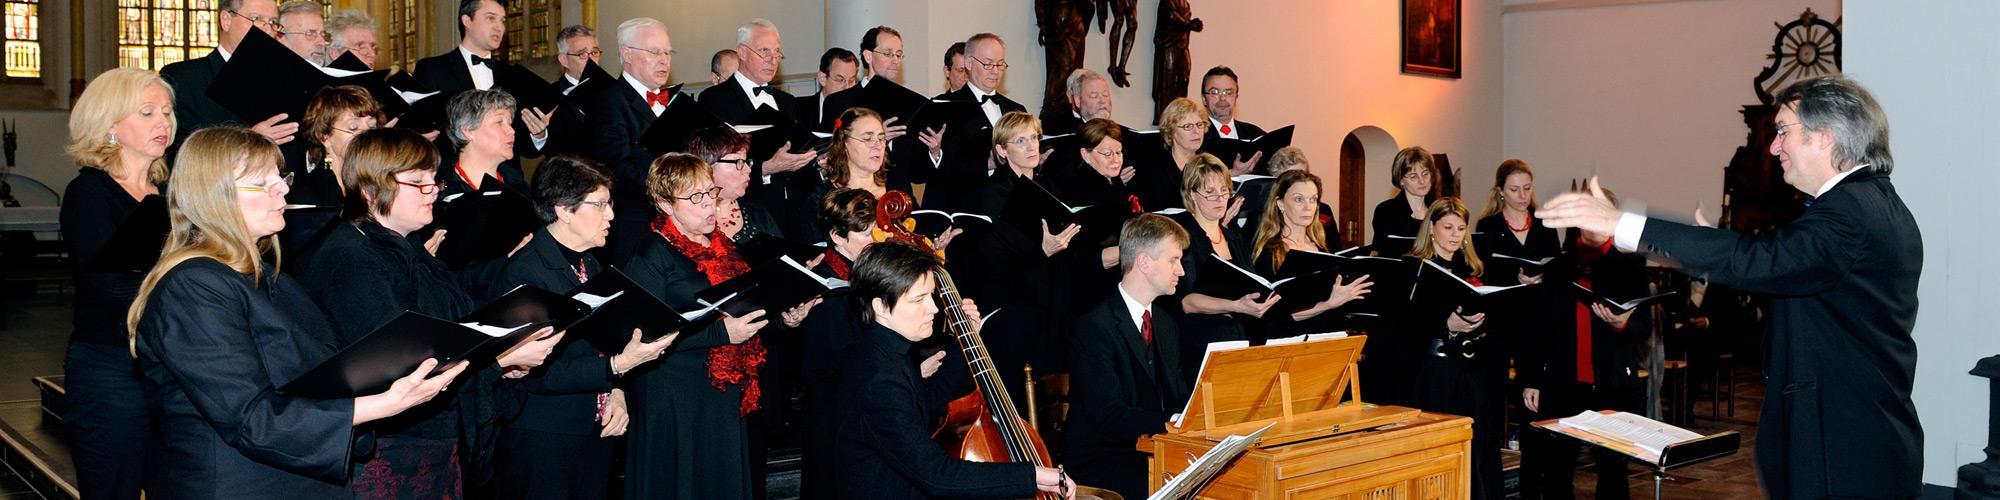 Bach - Over Ons - Koor